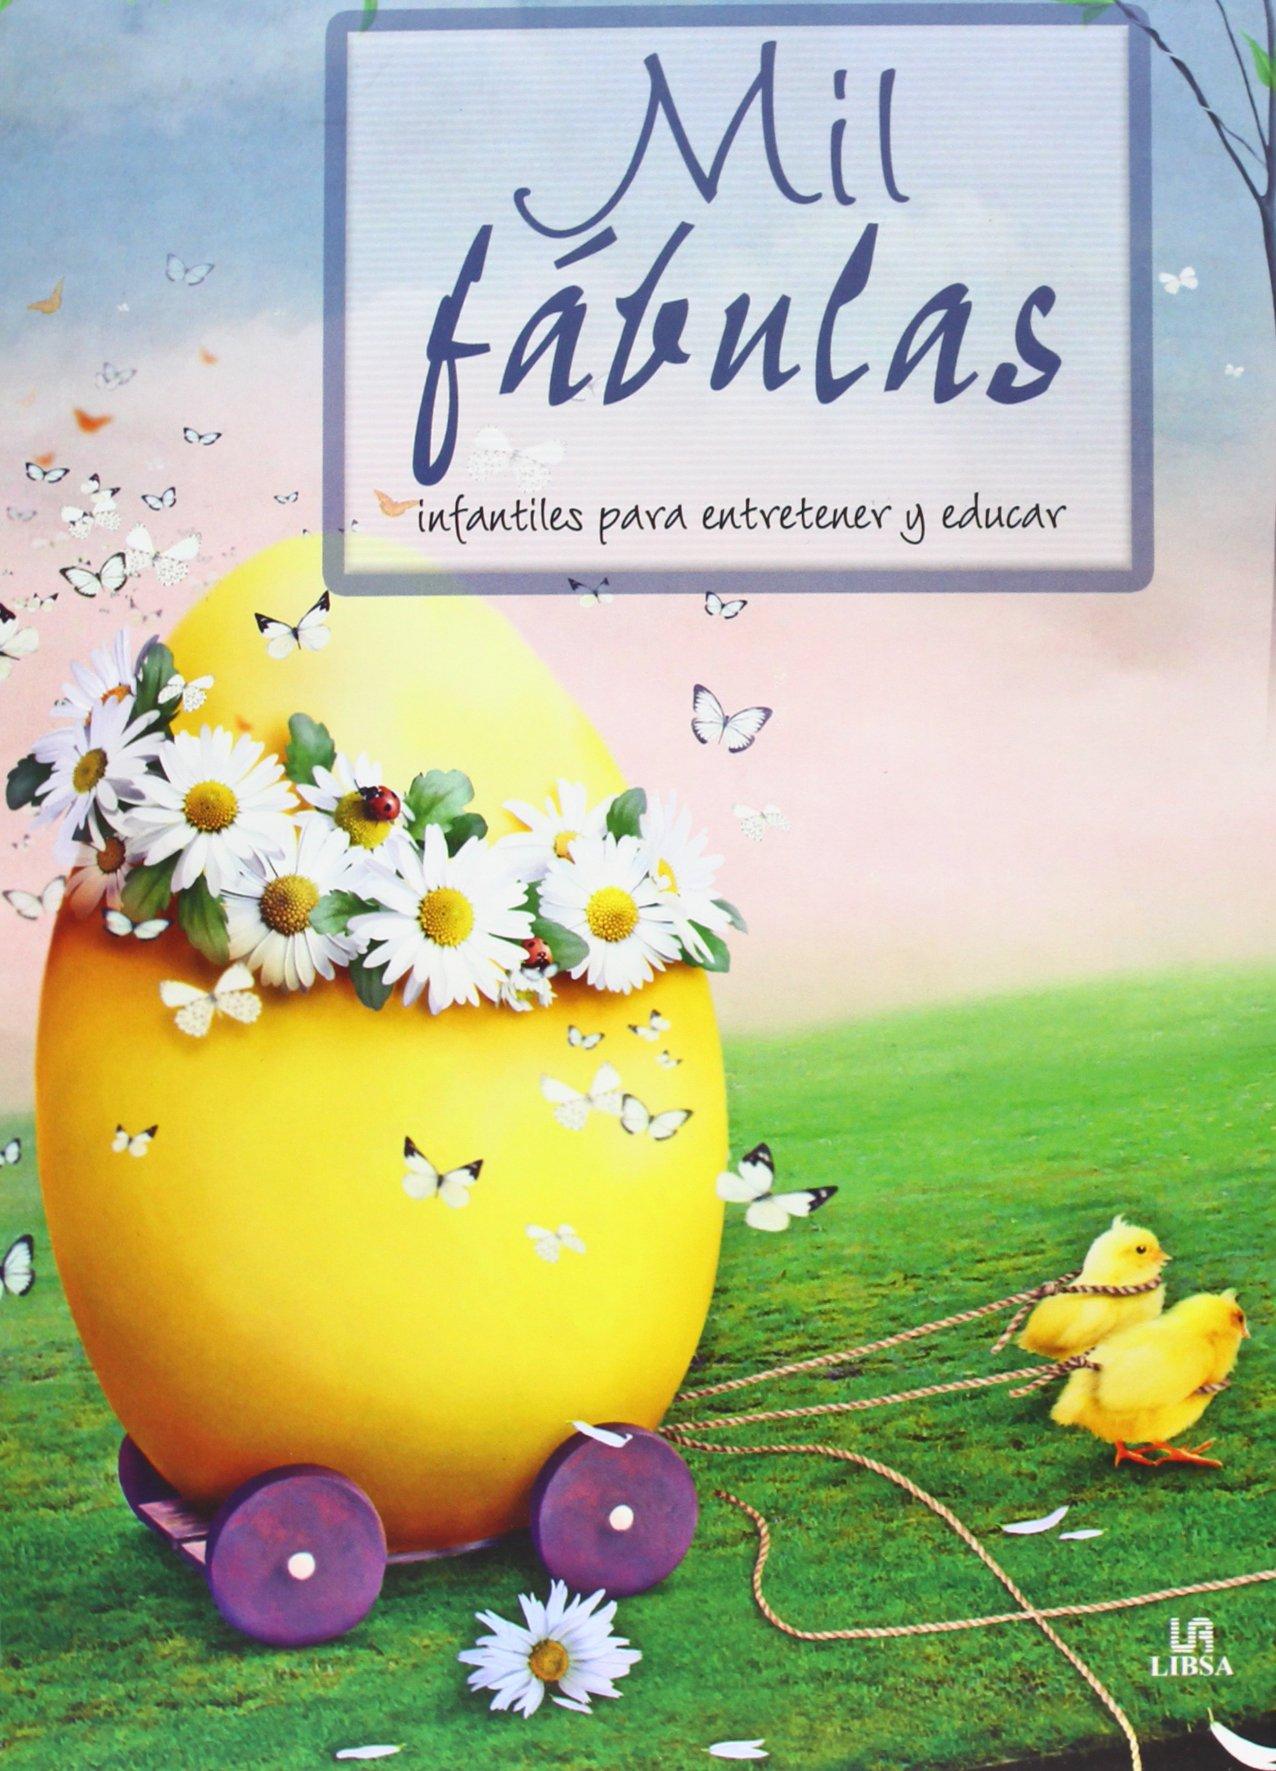 Read Online Mil fábulas infantiles para entretener y educar / 1000 fables to entertain and educate children (Spanish Edition) PDF